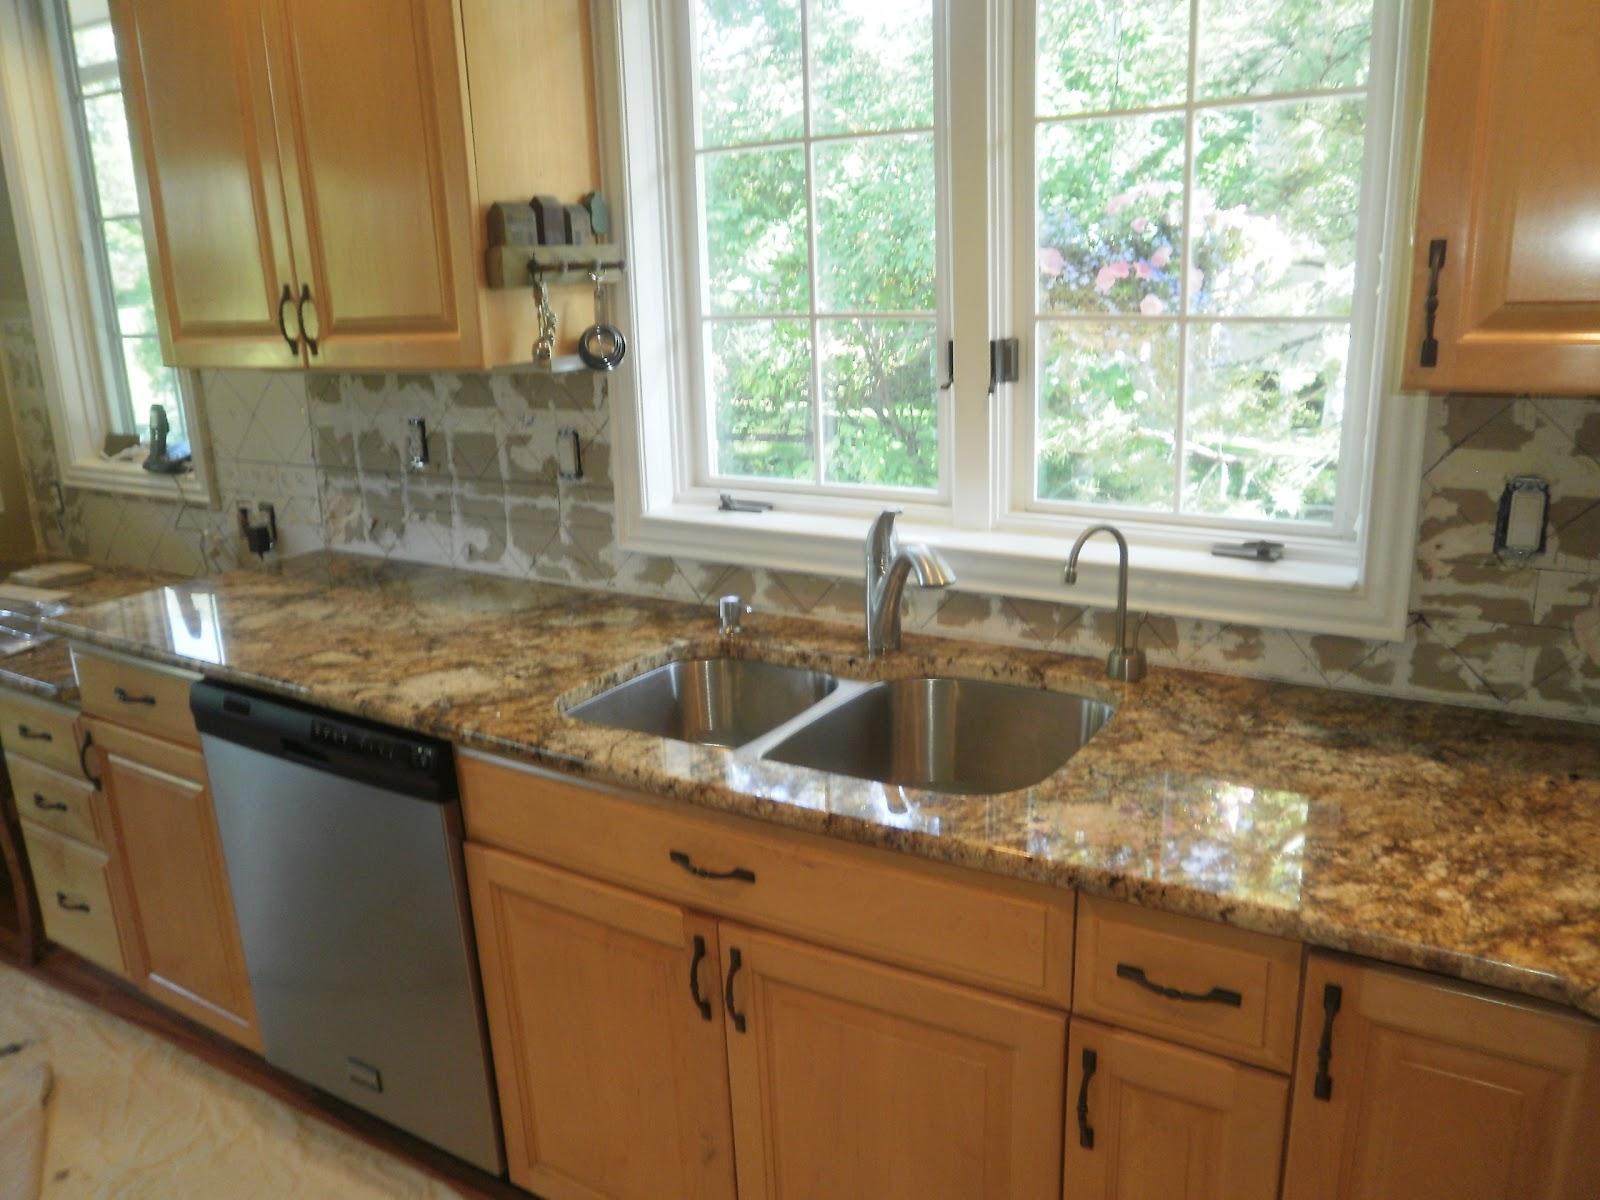 6X6 Kitchen Tile Backsplash